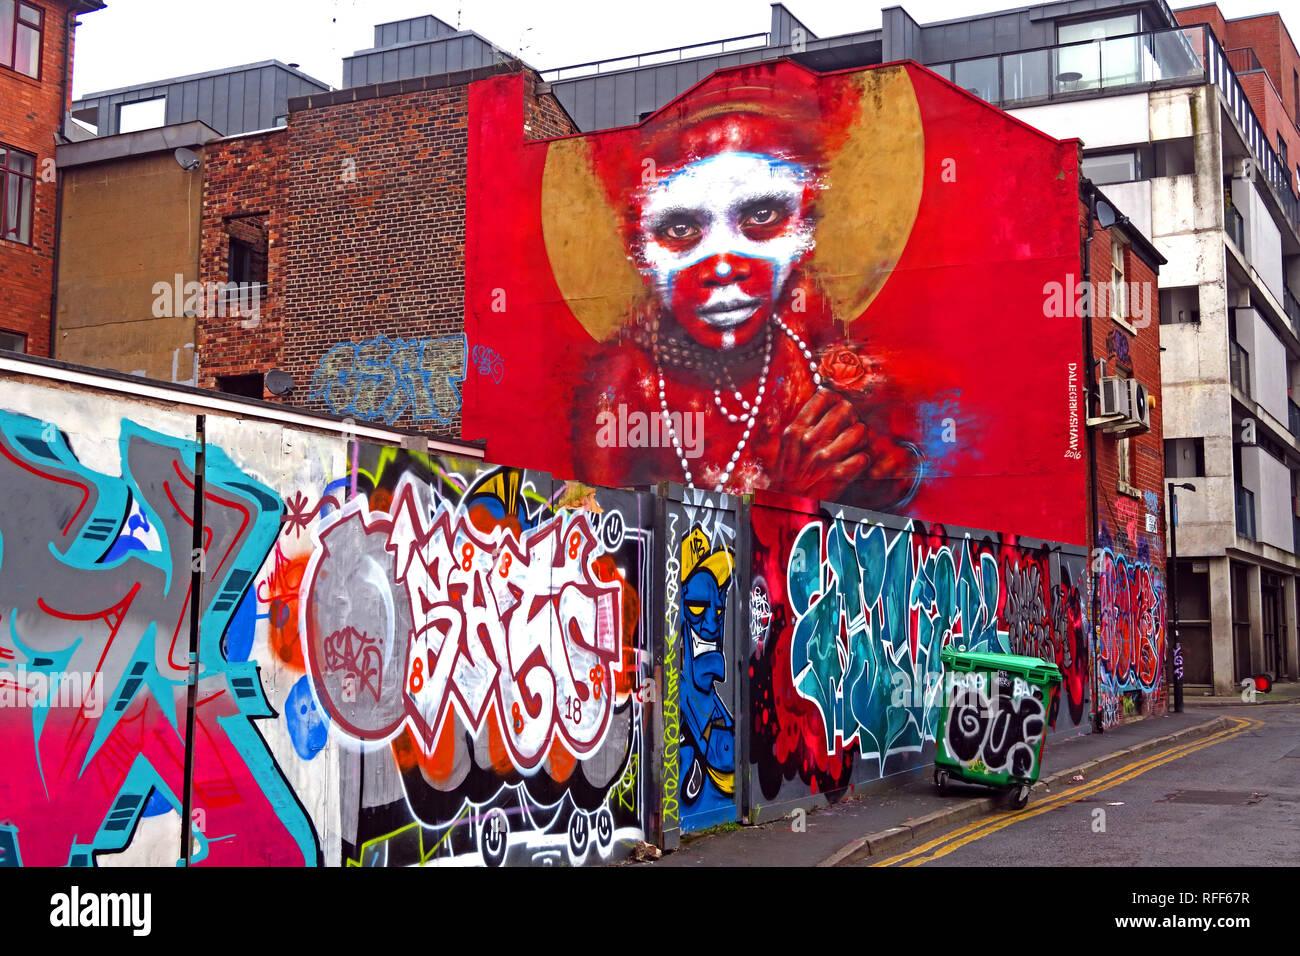 Manchester,City centre,city,@HotpixUK,HotpixUK,GoTonySmith,North West England,UK,England,urban art,art,streetart,street art,vibrant,Northern Quarter,NQ4,M1 1DF,Urban art,North West,M1,artist,artwork,urban,Aboriginal face,native,red,background,paint,painting,graffiti,Spear St